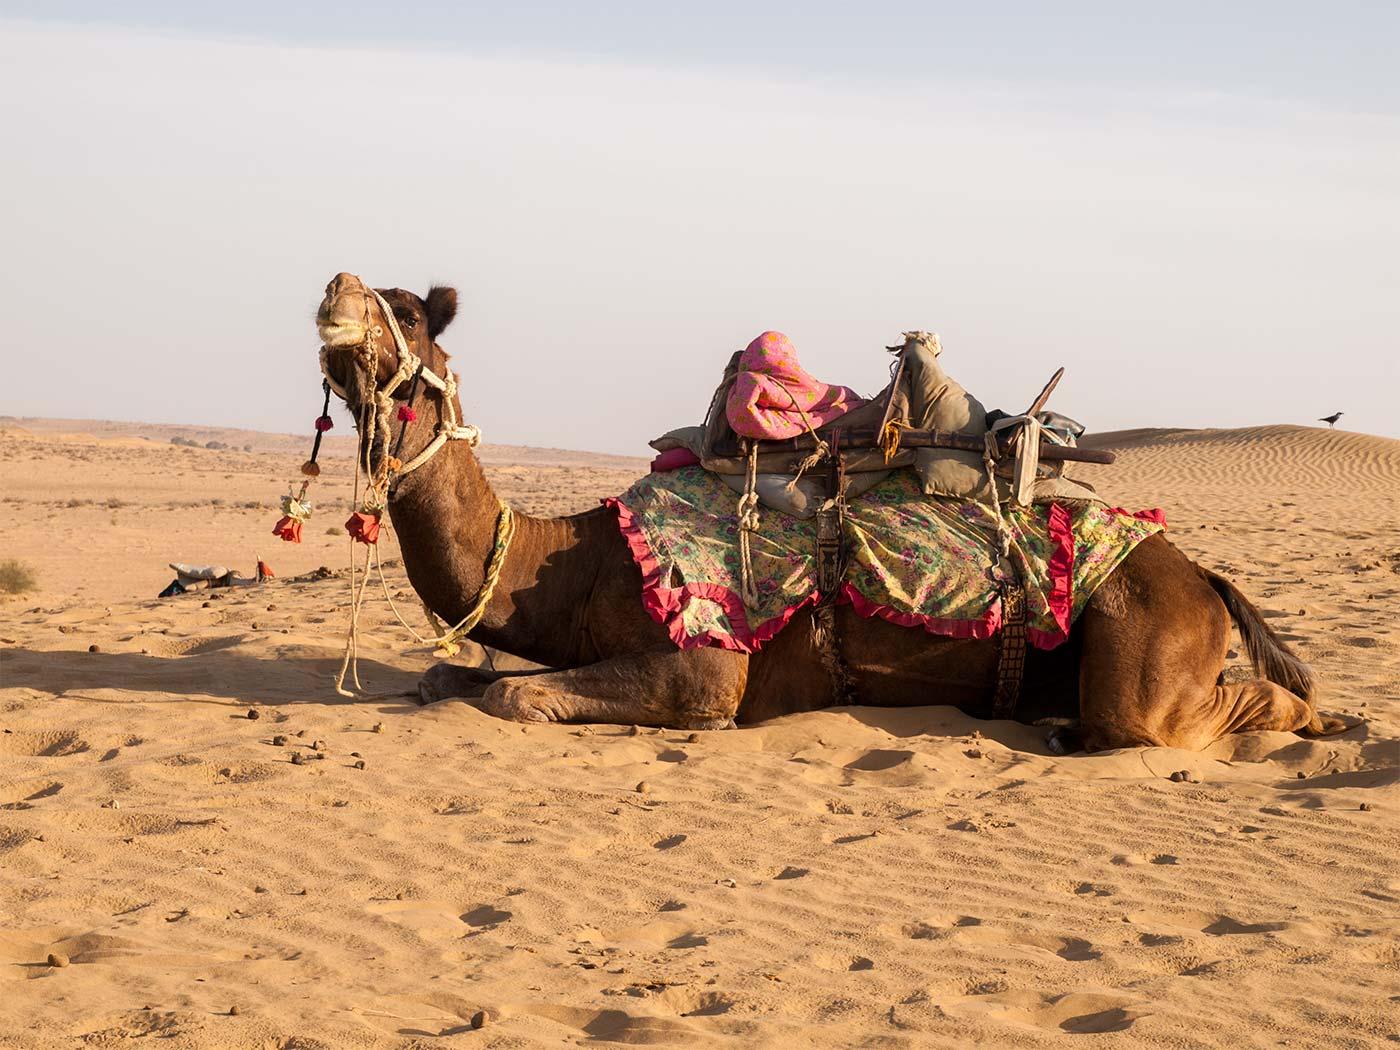 Thar Desert - Jaisalmer | Happymind Travels